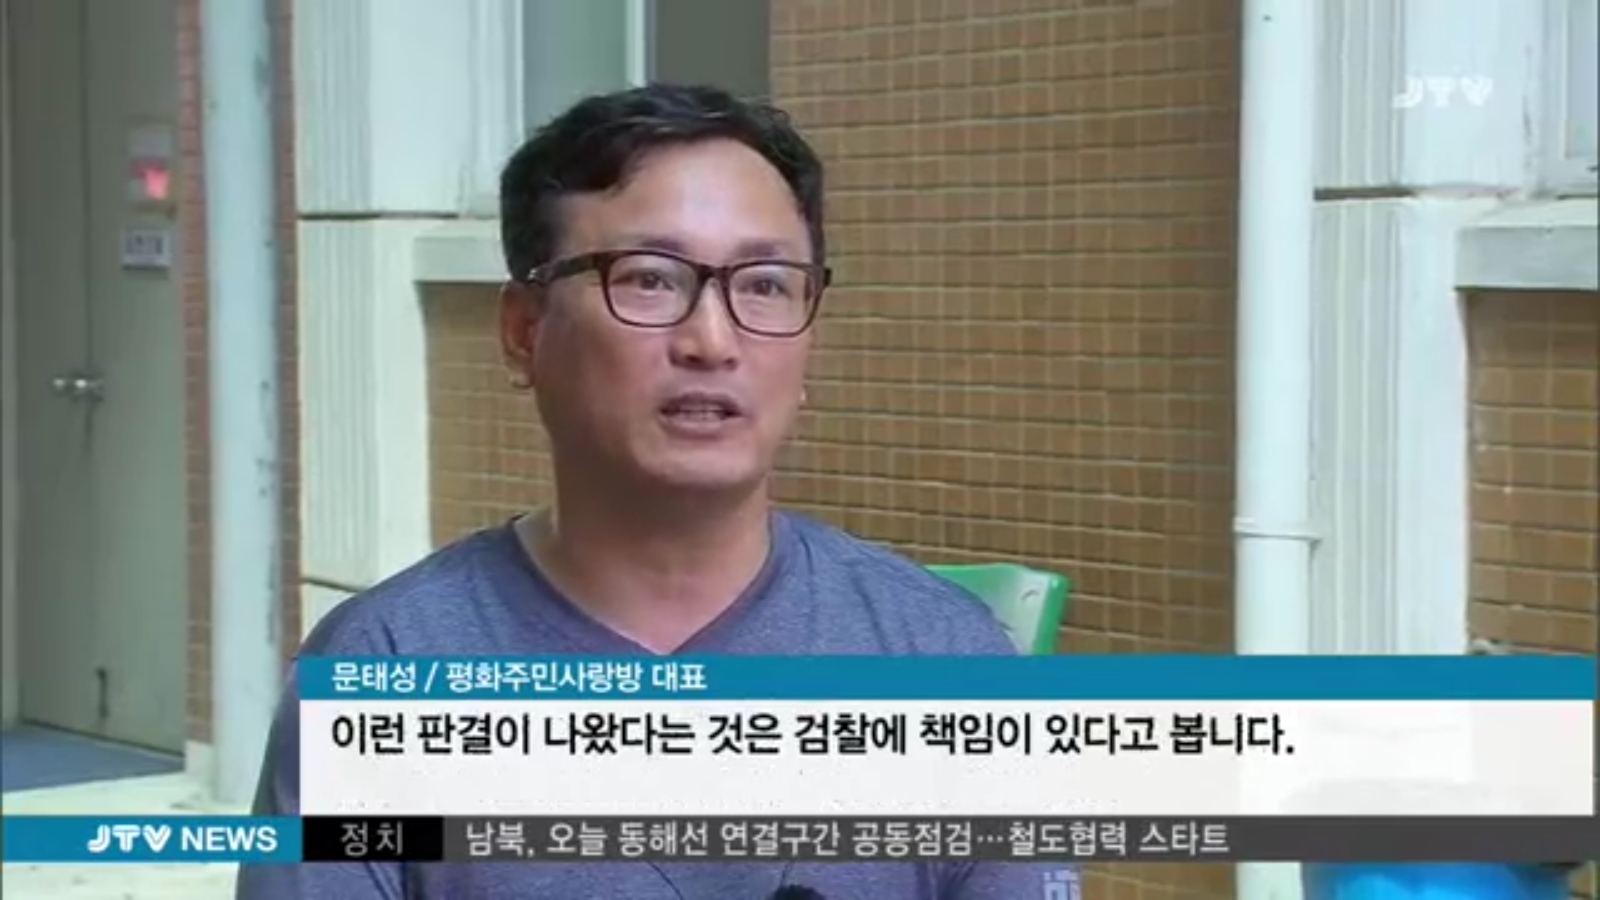 [18.7.20 JTV] 전주 봉침게이트, 검찰은 기소축소... 법원은 재판거래...5.jpg